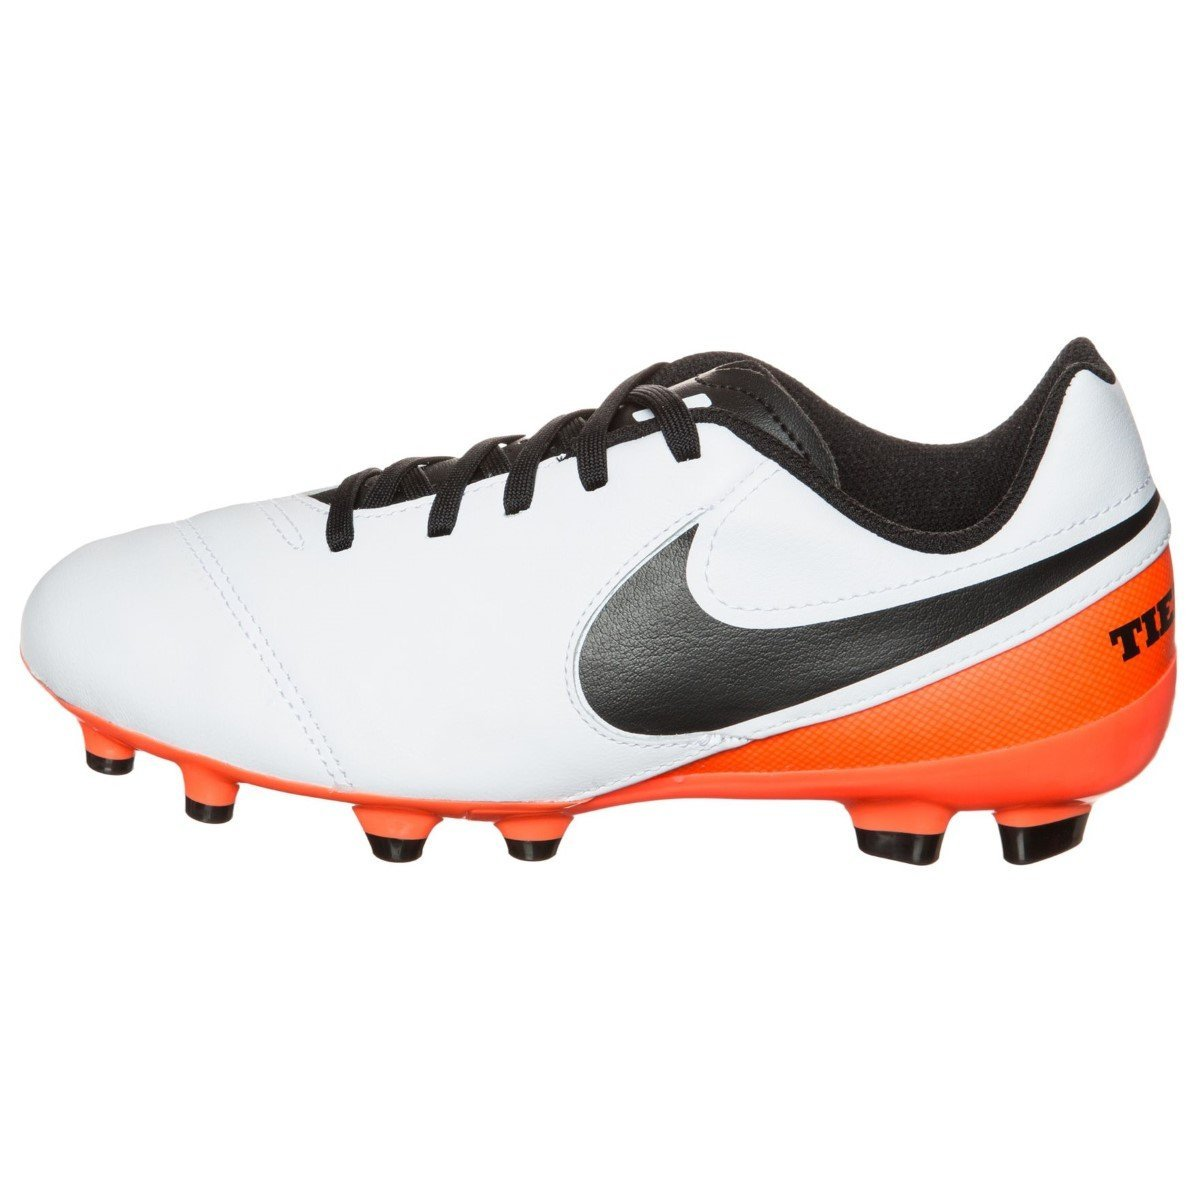 35d1b2d9e Amazon.com | NIKE Kids Tiempo Legend VI FG Shoes Cleats (5) | Football